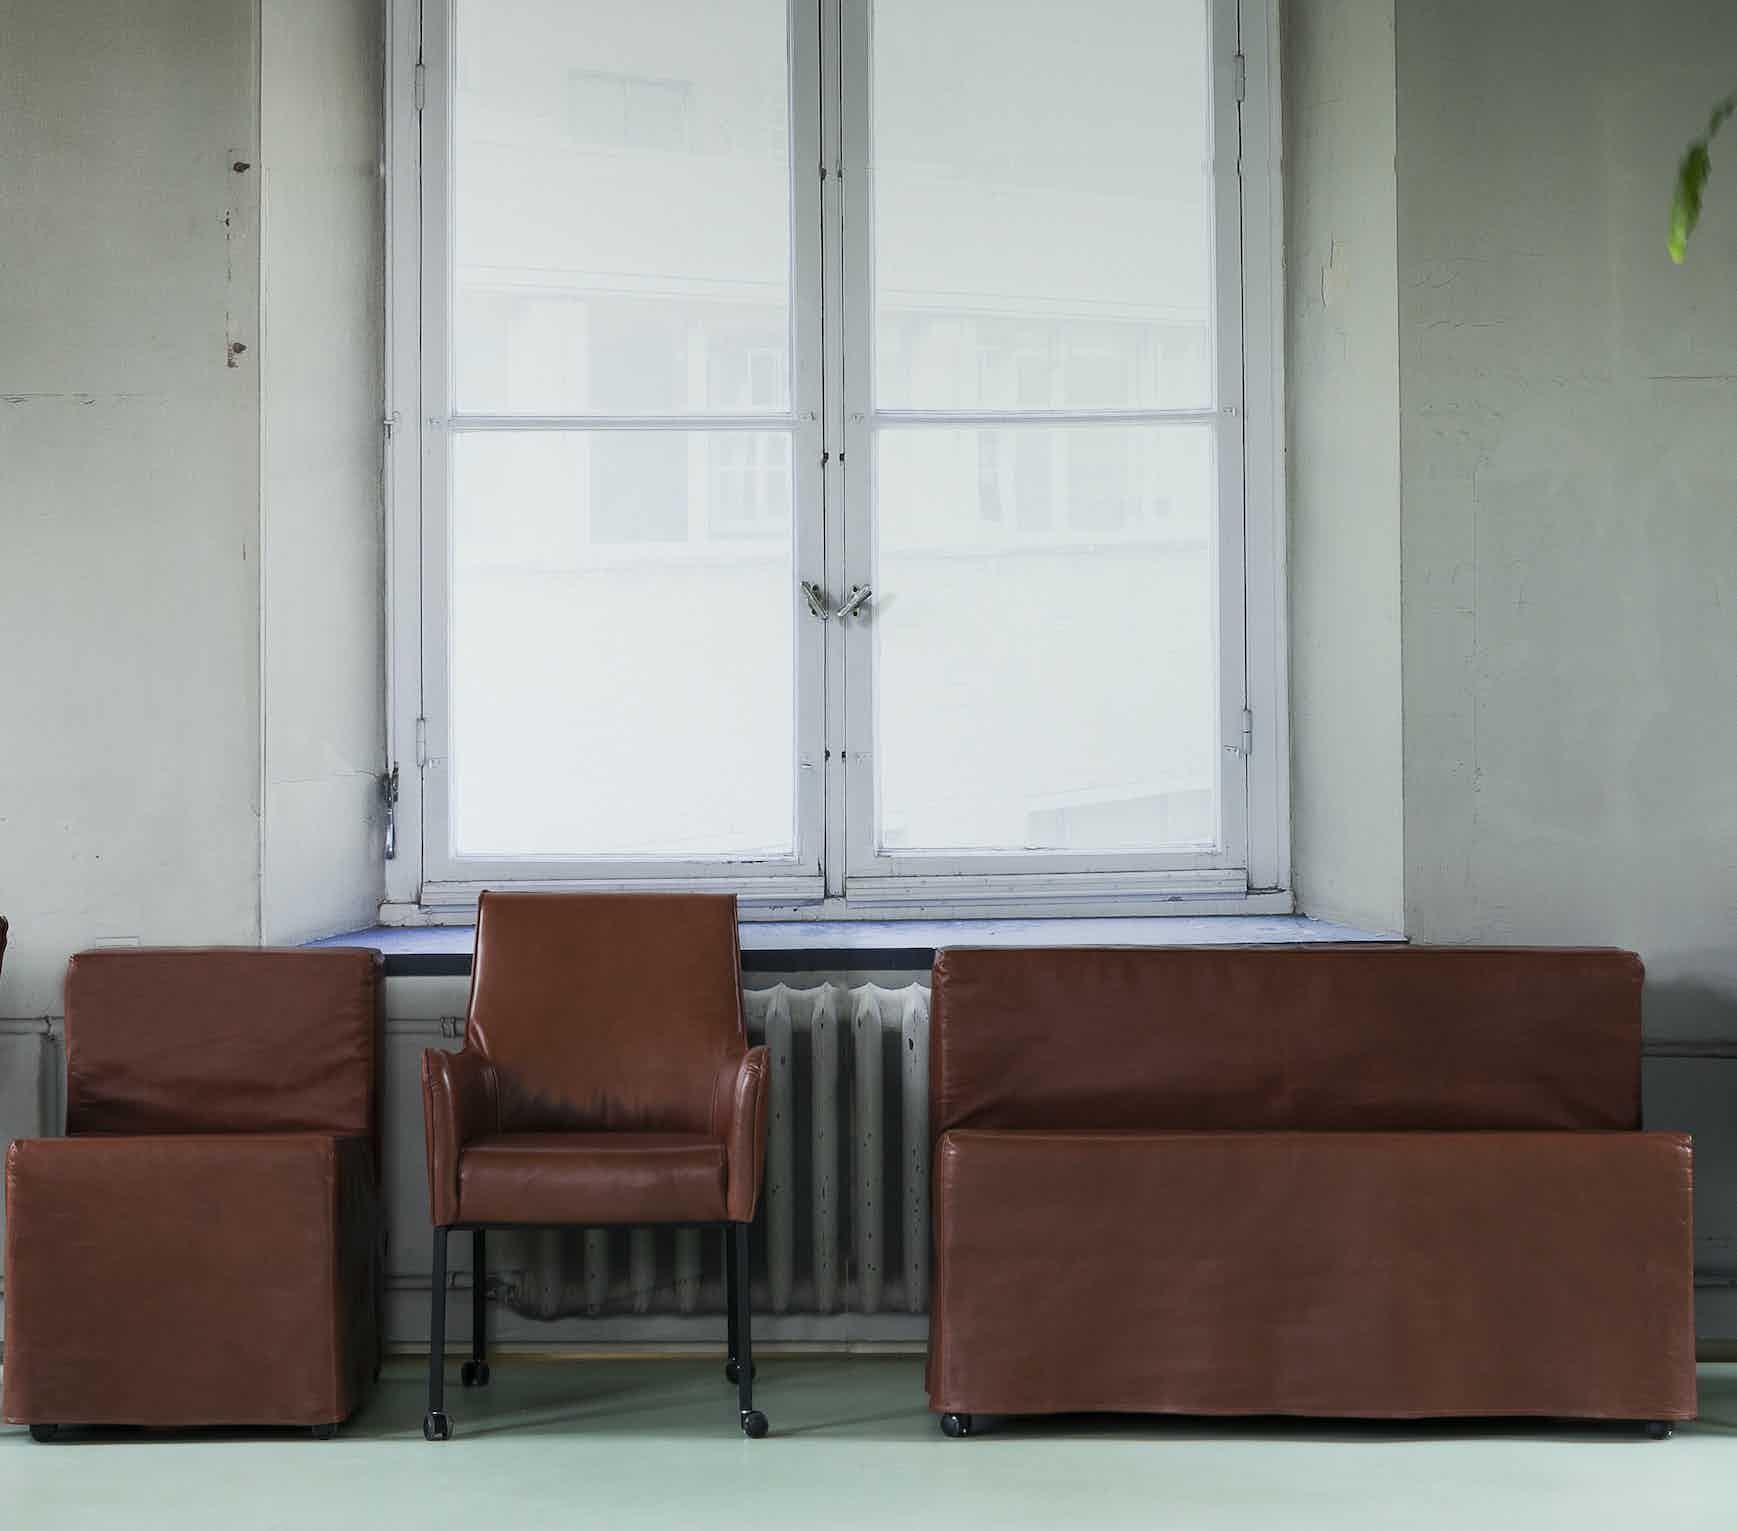 Linteloo-front-dwi-chair-institu-haute-living